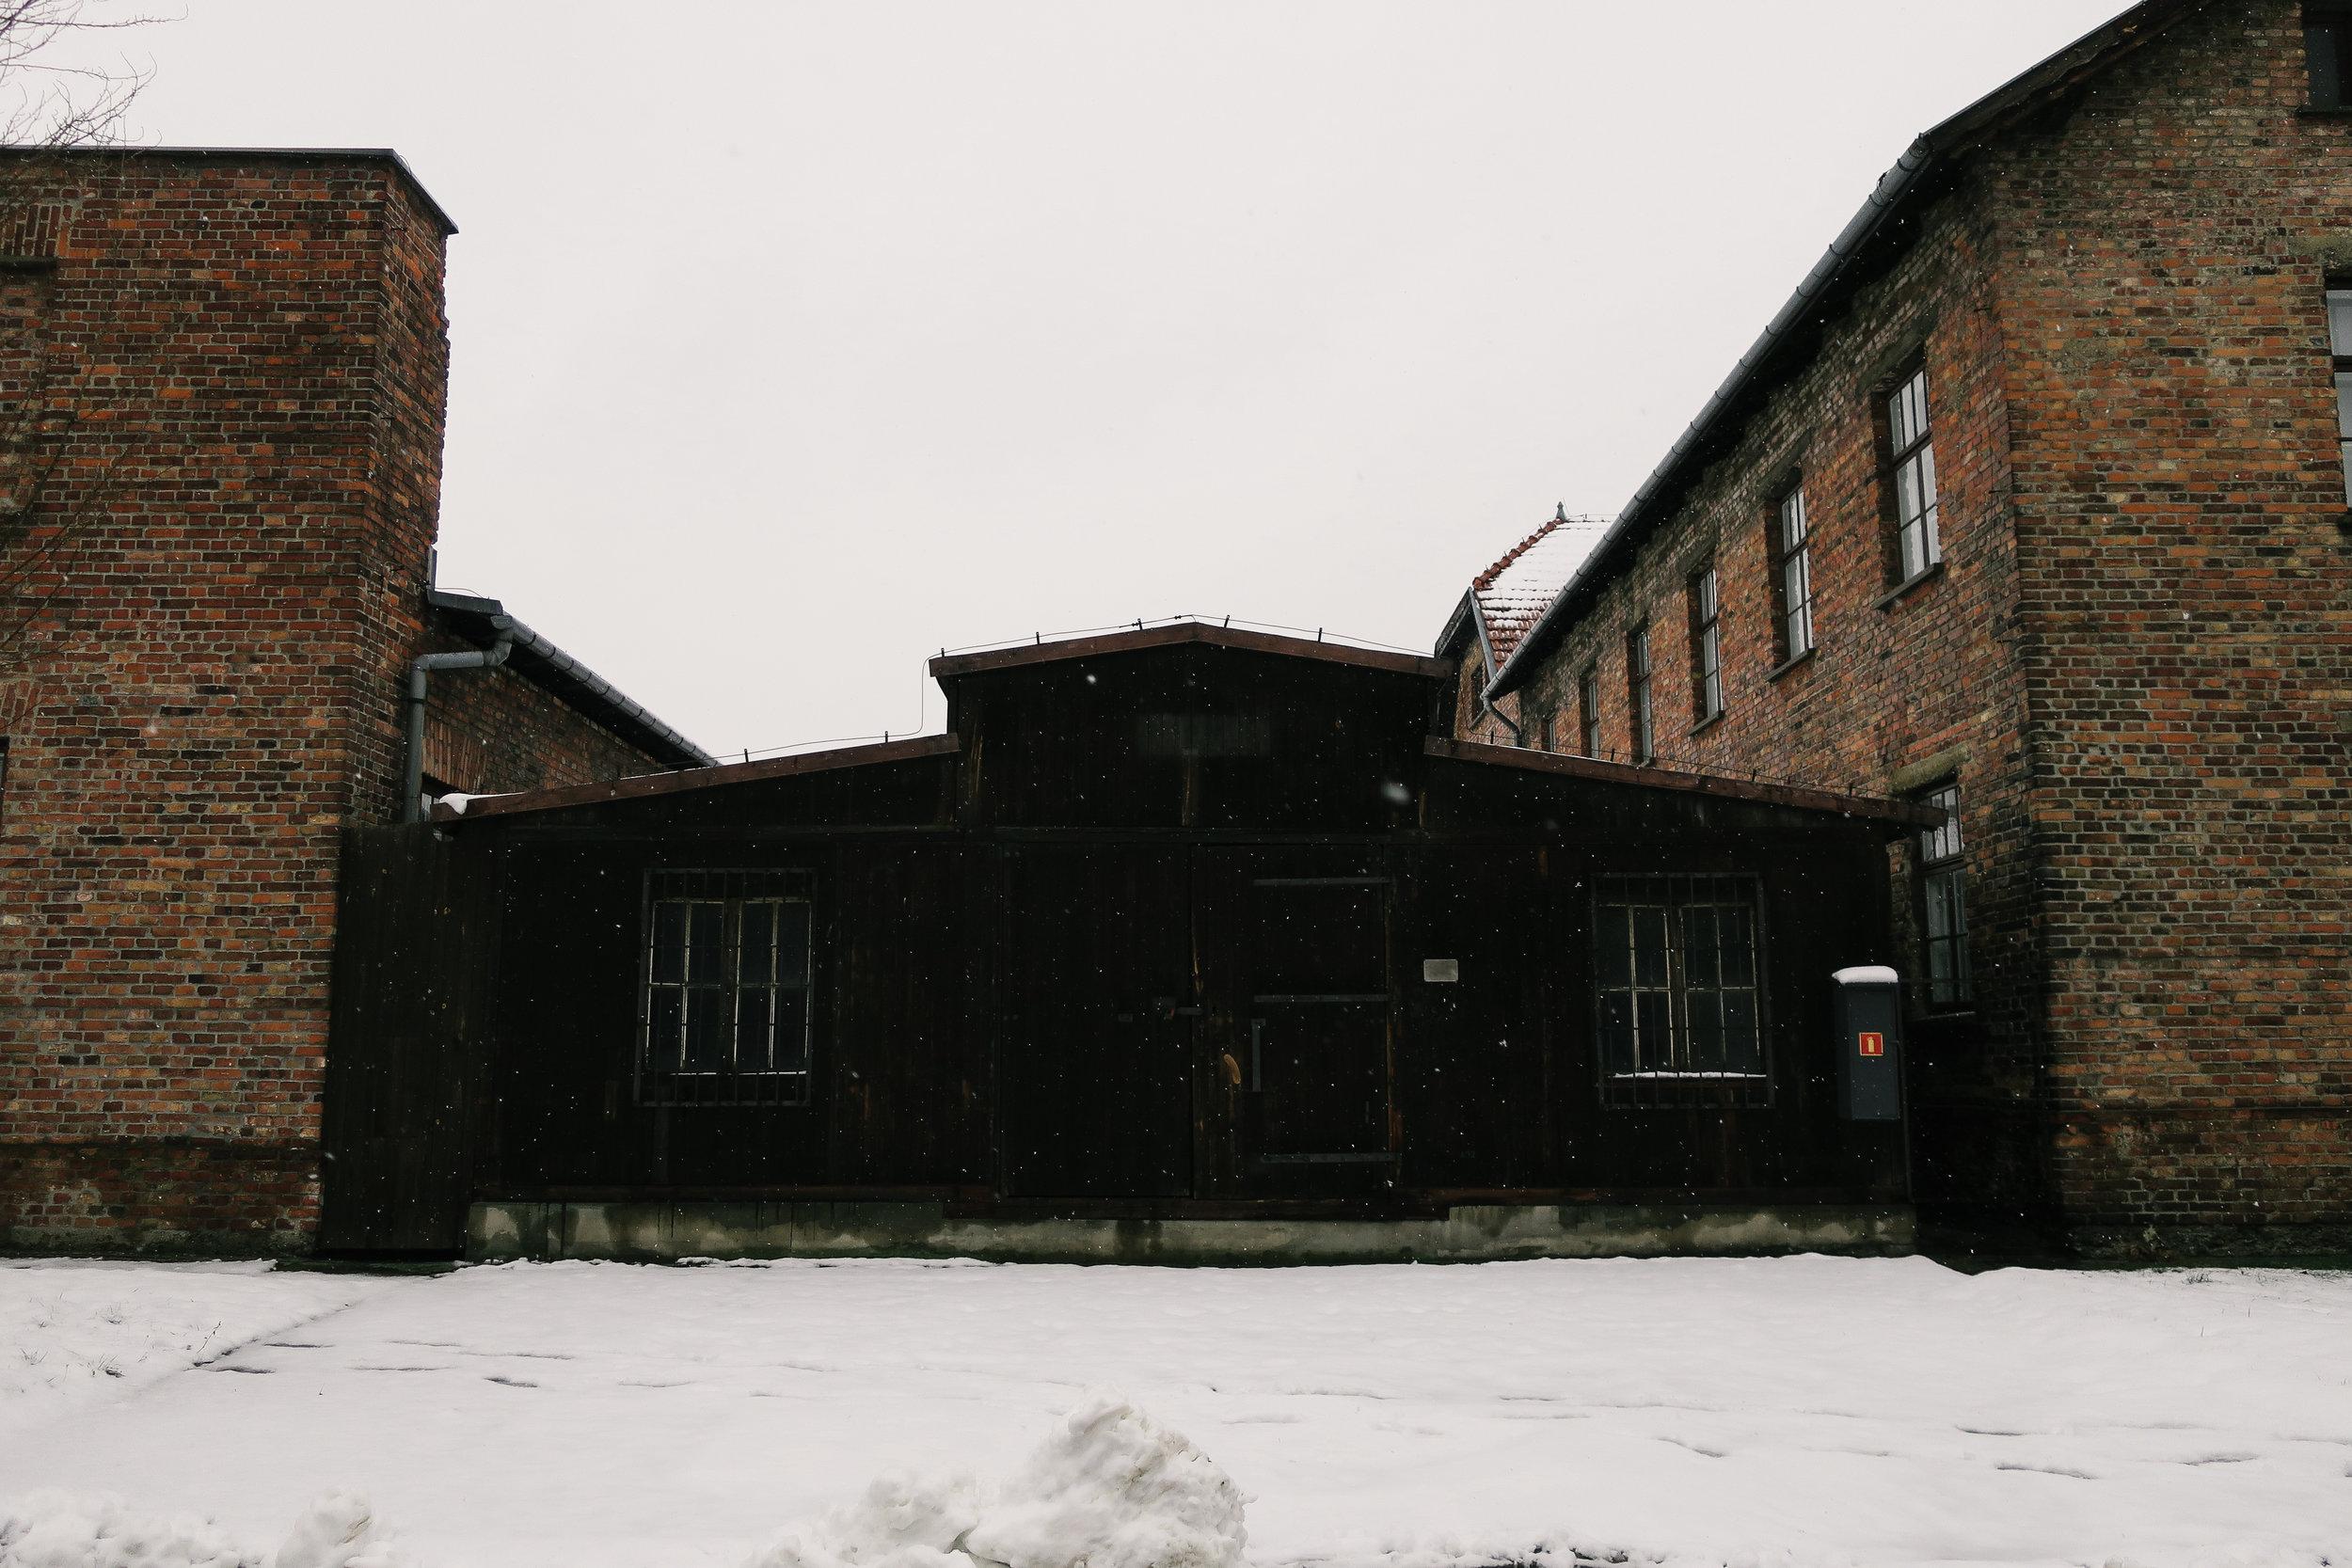 aushwitz-krakow-poland-travel-guide-lifeonpin_IMG_0208.jpg